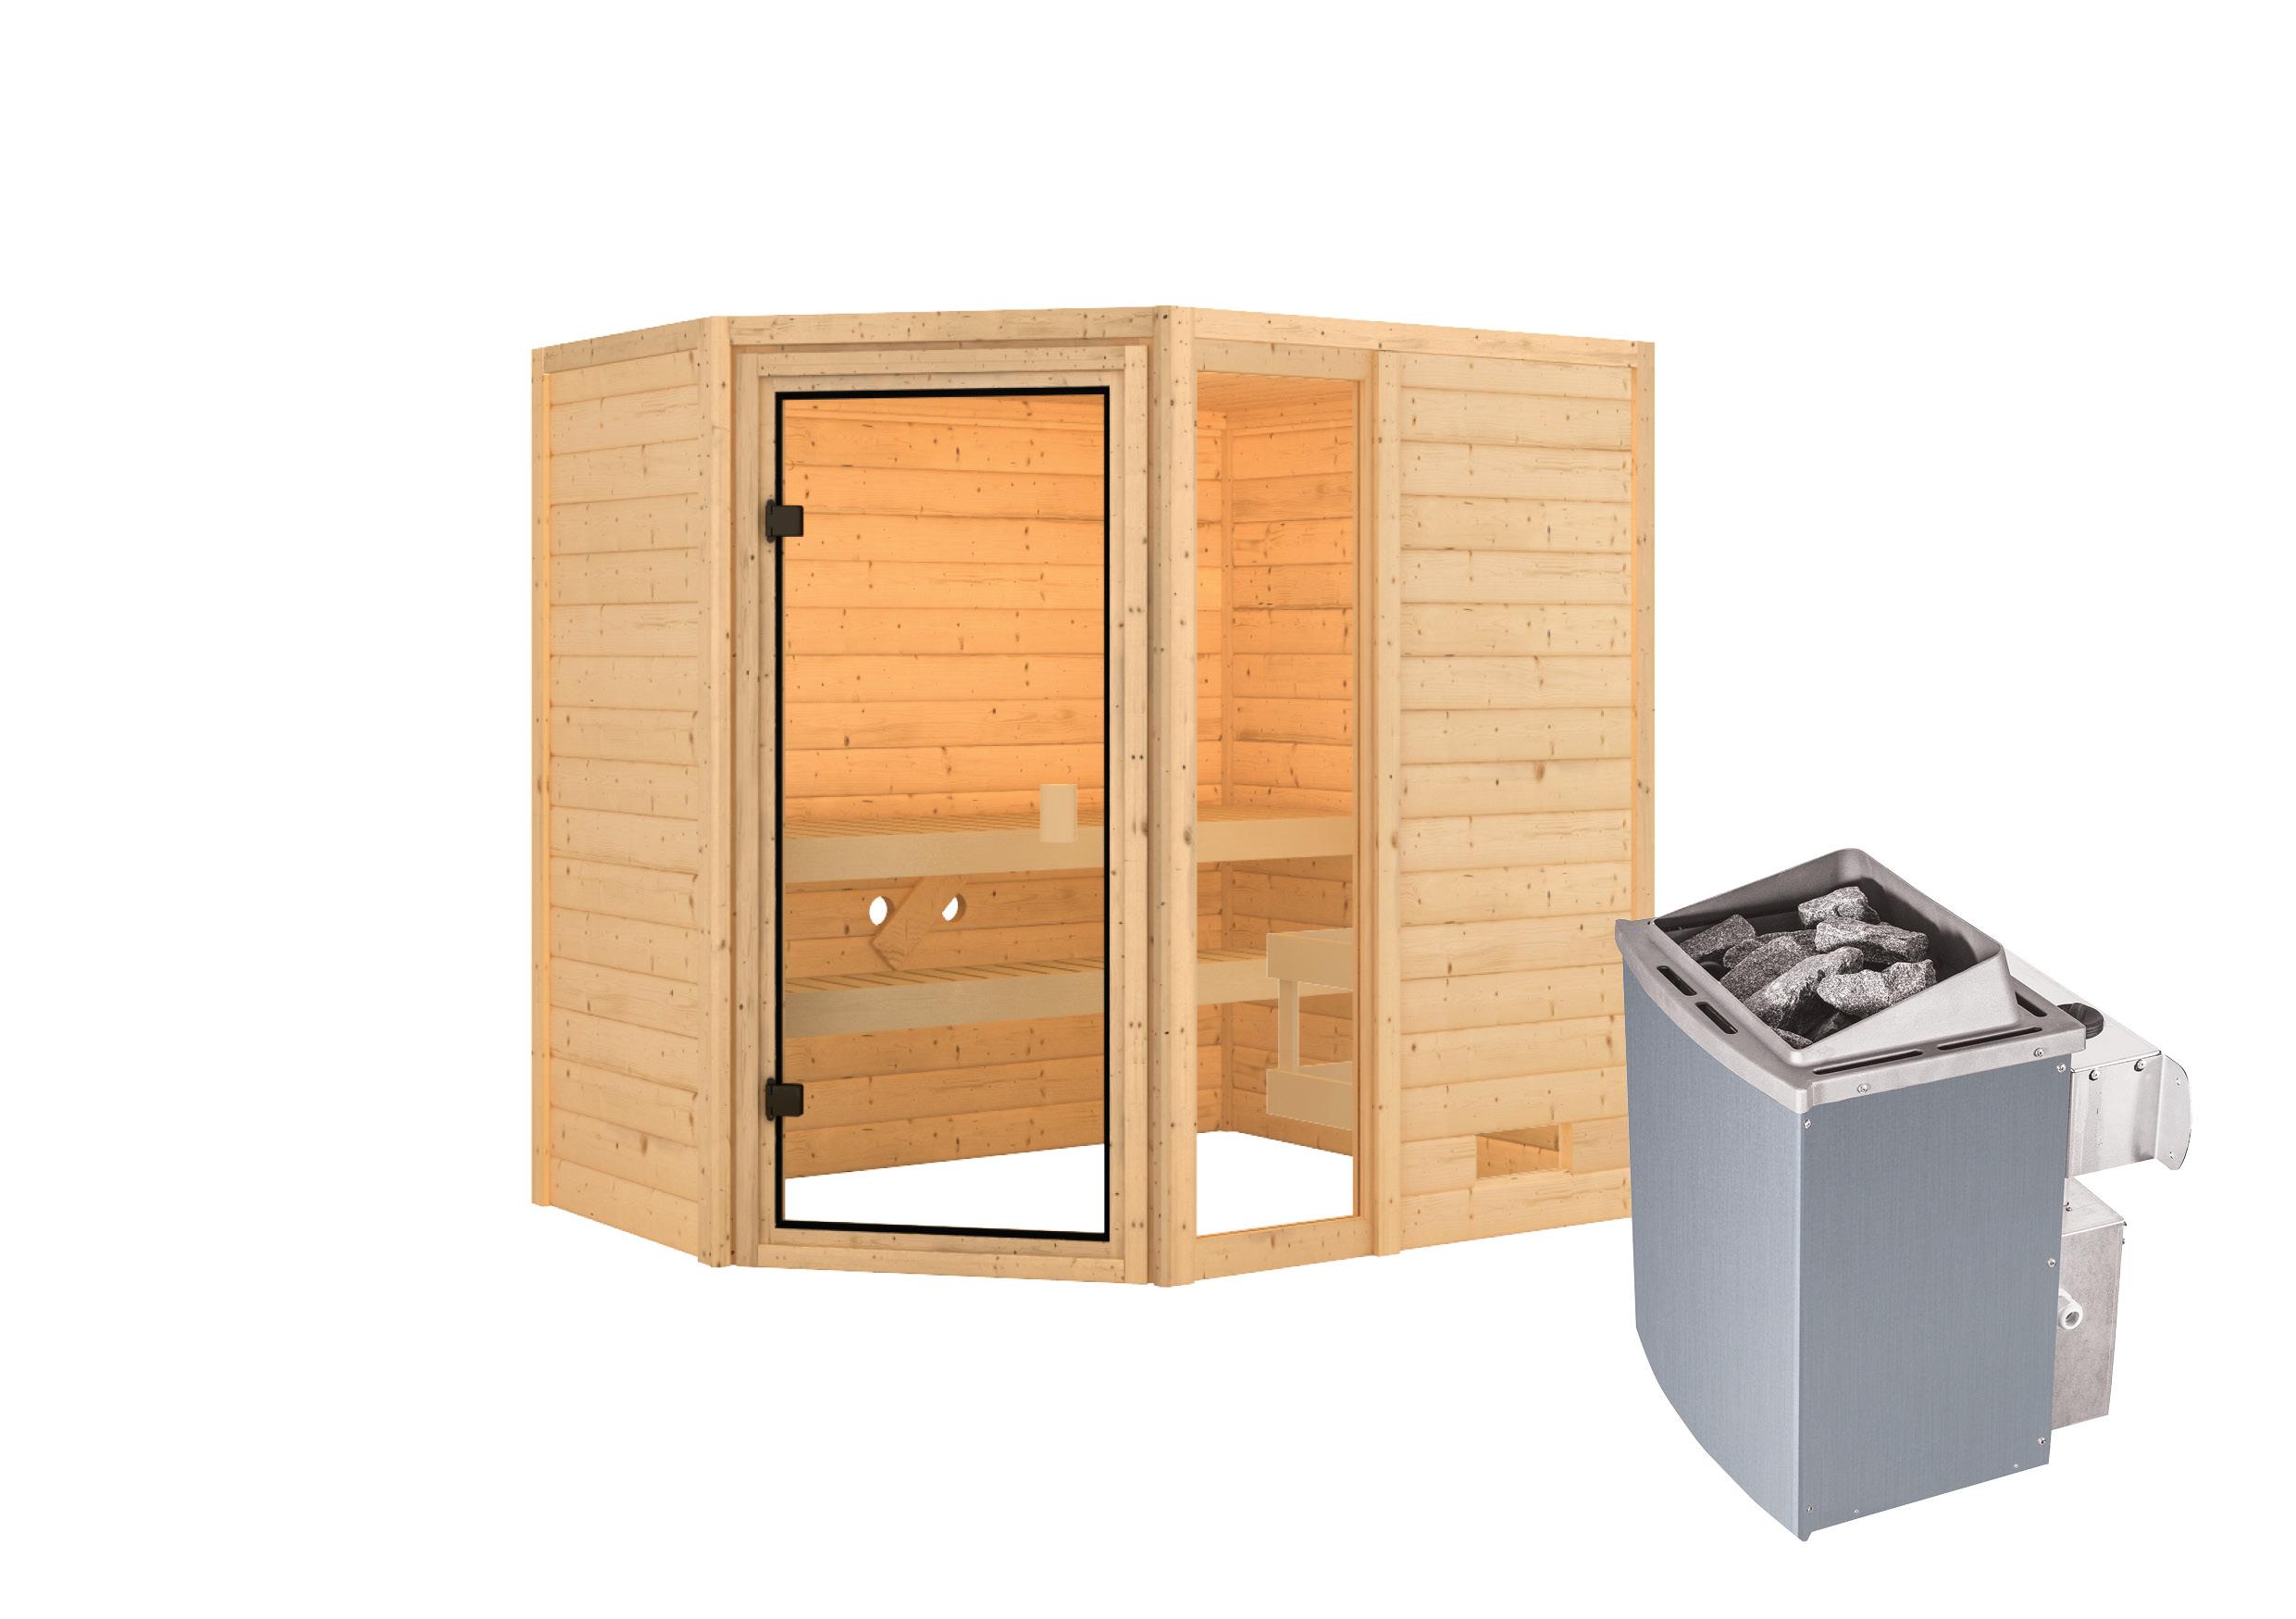 Woodfeeling Sauna Jada 38mm Saunaofen 9 kW intern Bild 6